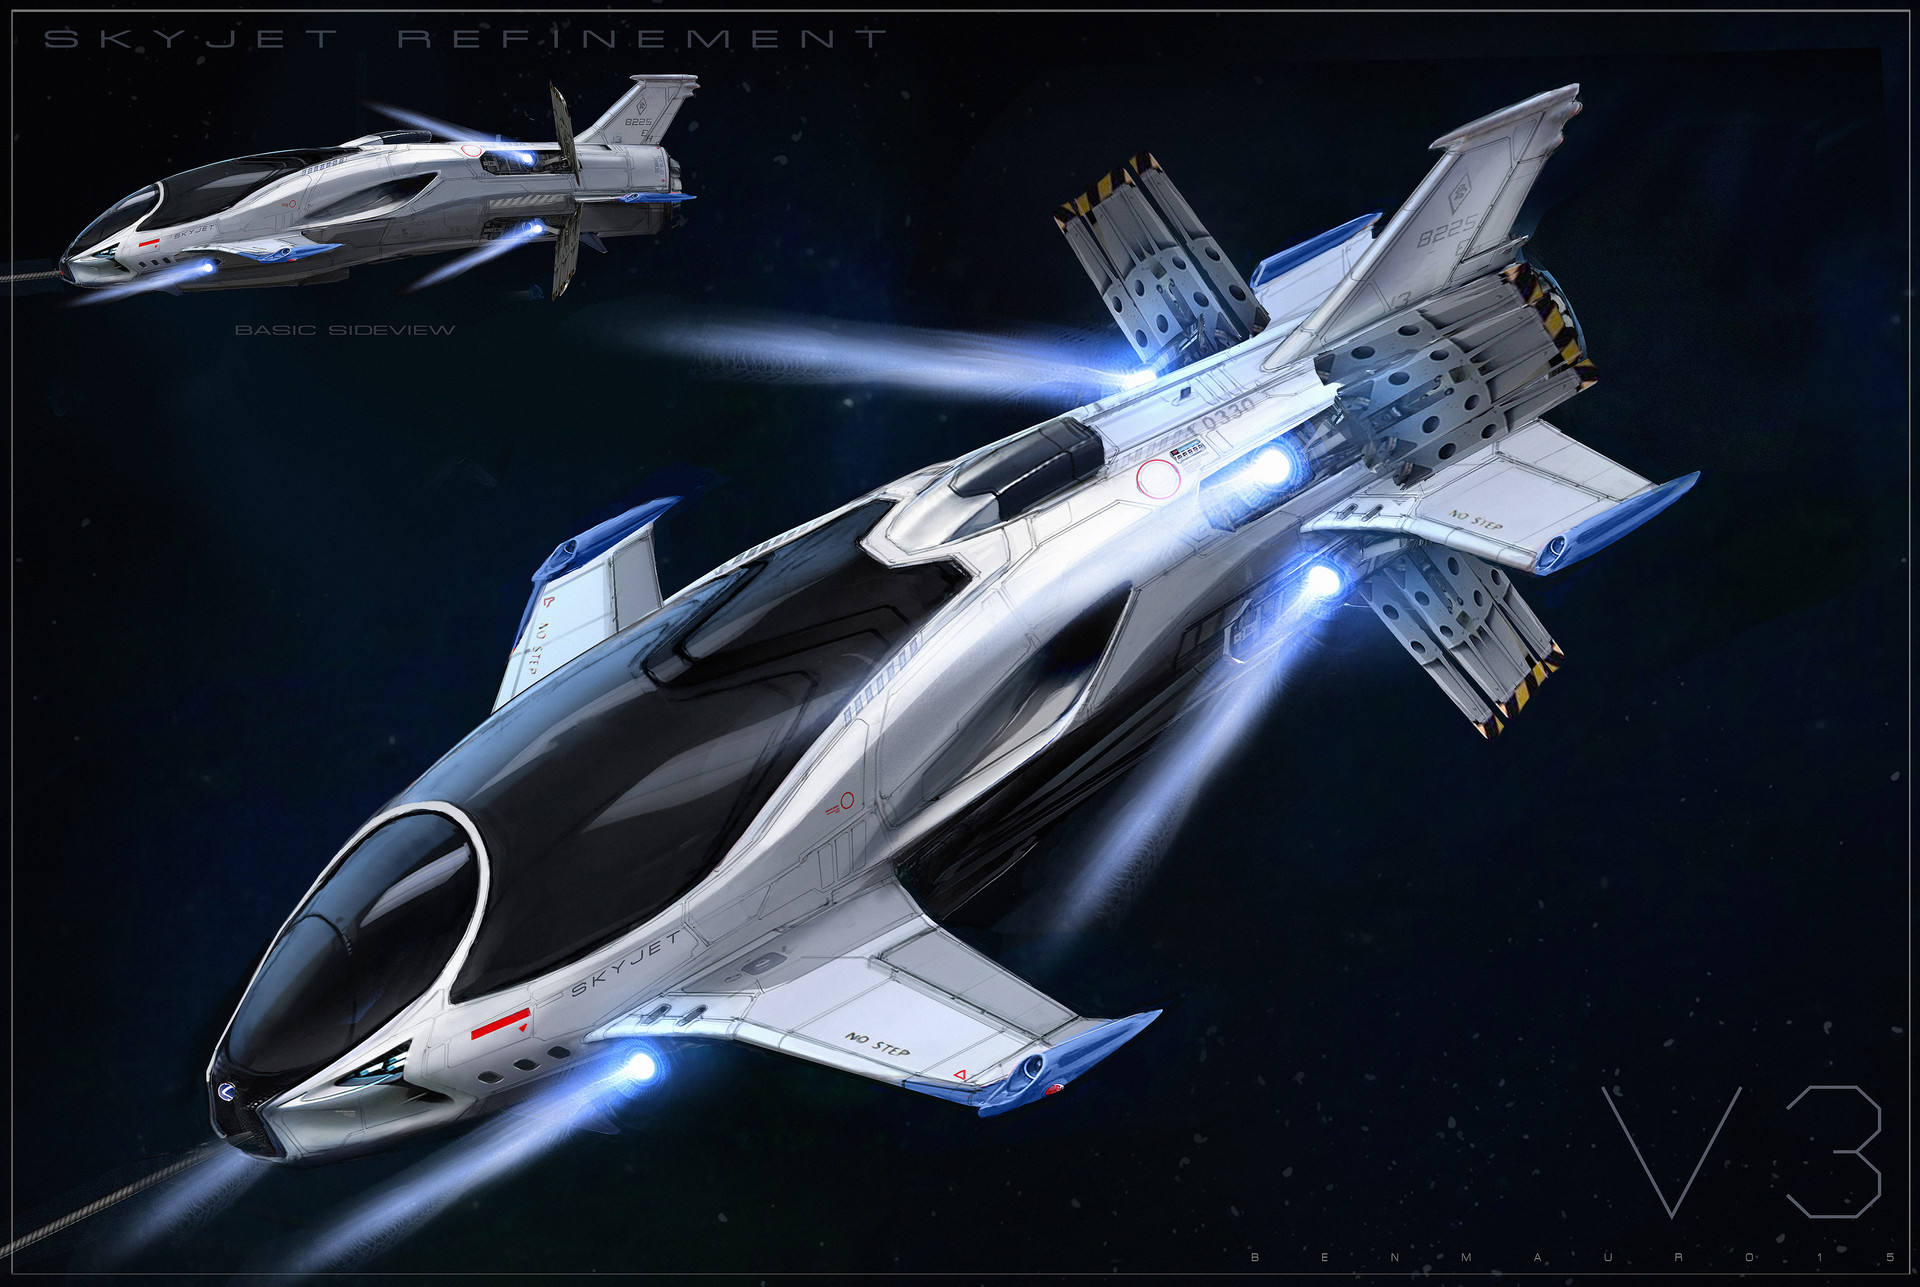 Ben mauro skyjet lexus updateairbrake 03 bmssss